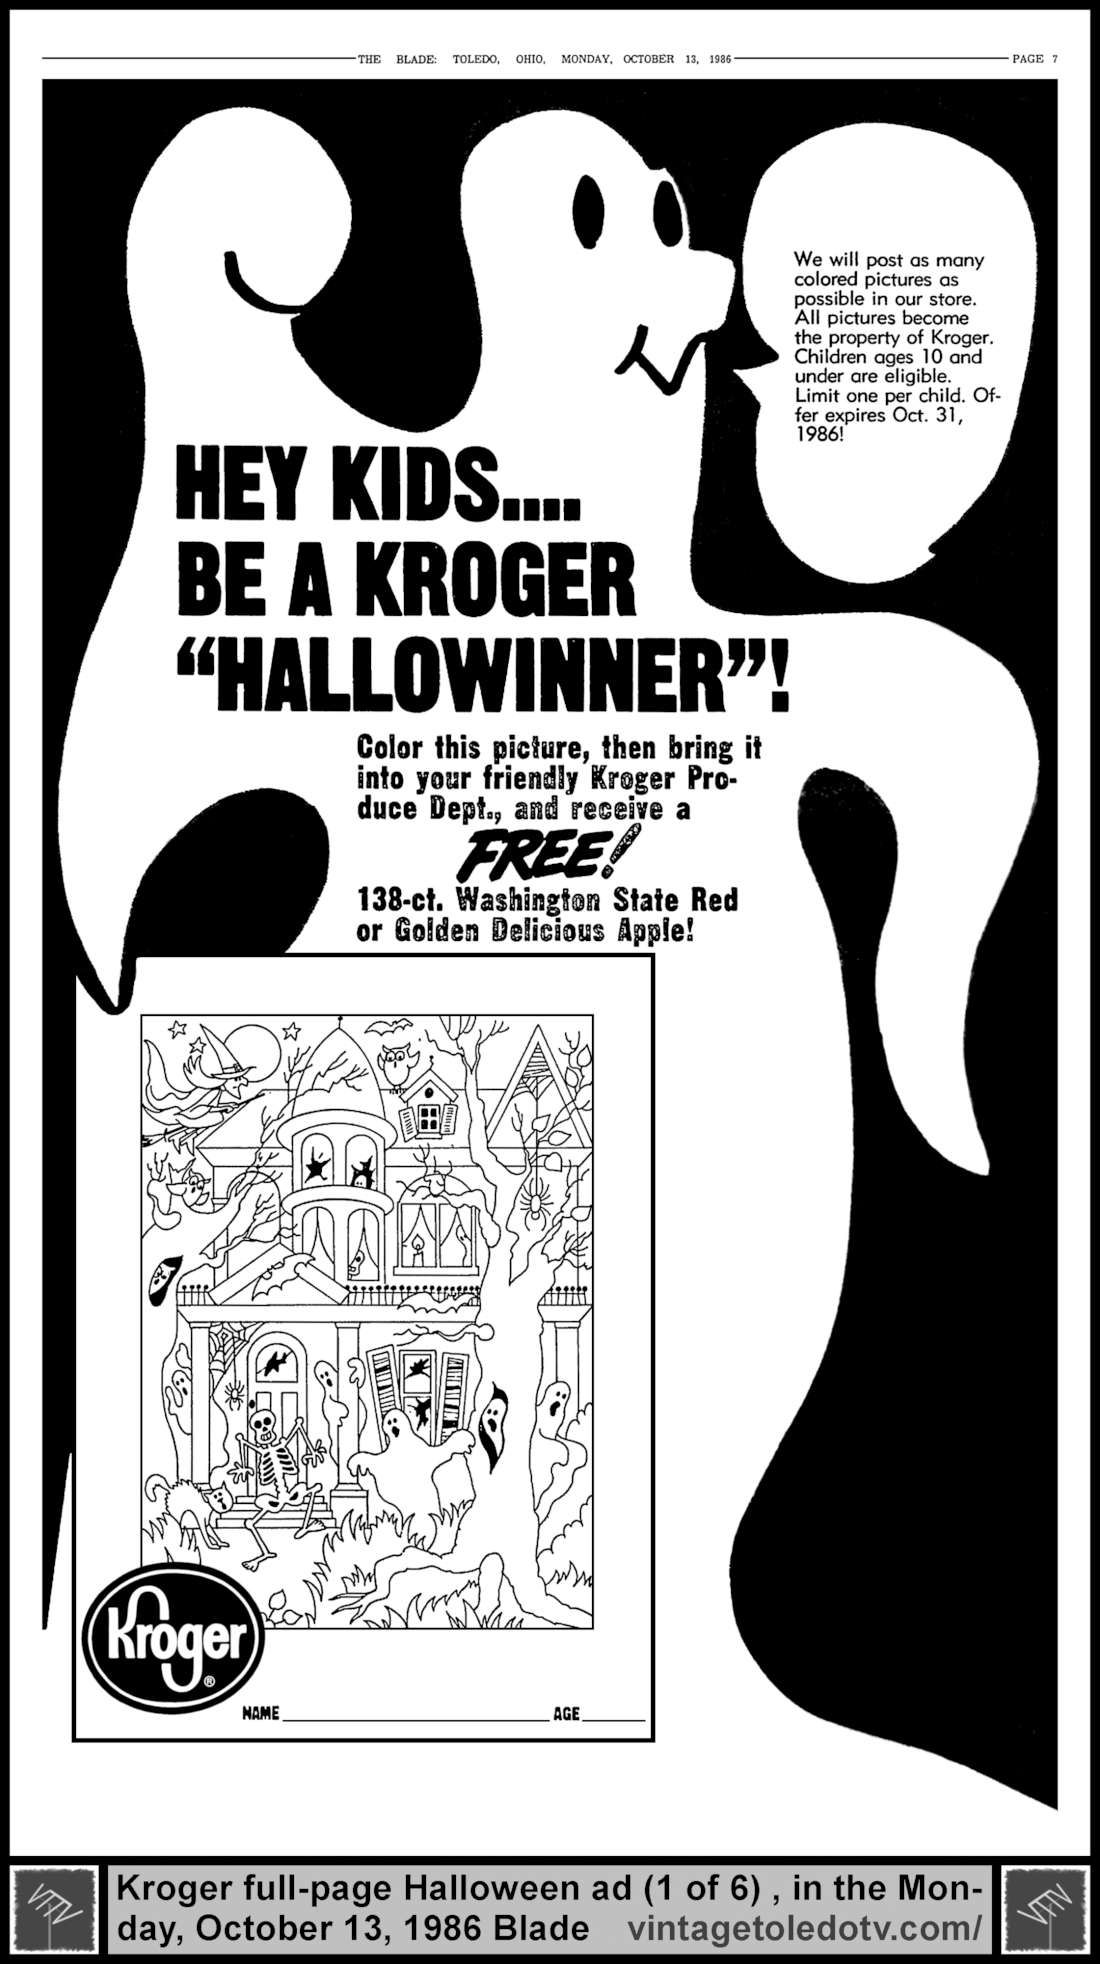 Vintage Toledo TV - Halloween Ads - Hey Kids...Be a Kroger ...